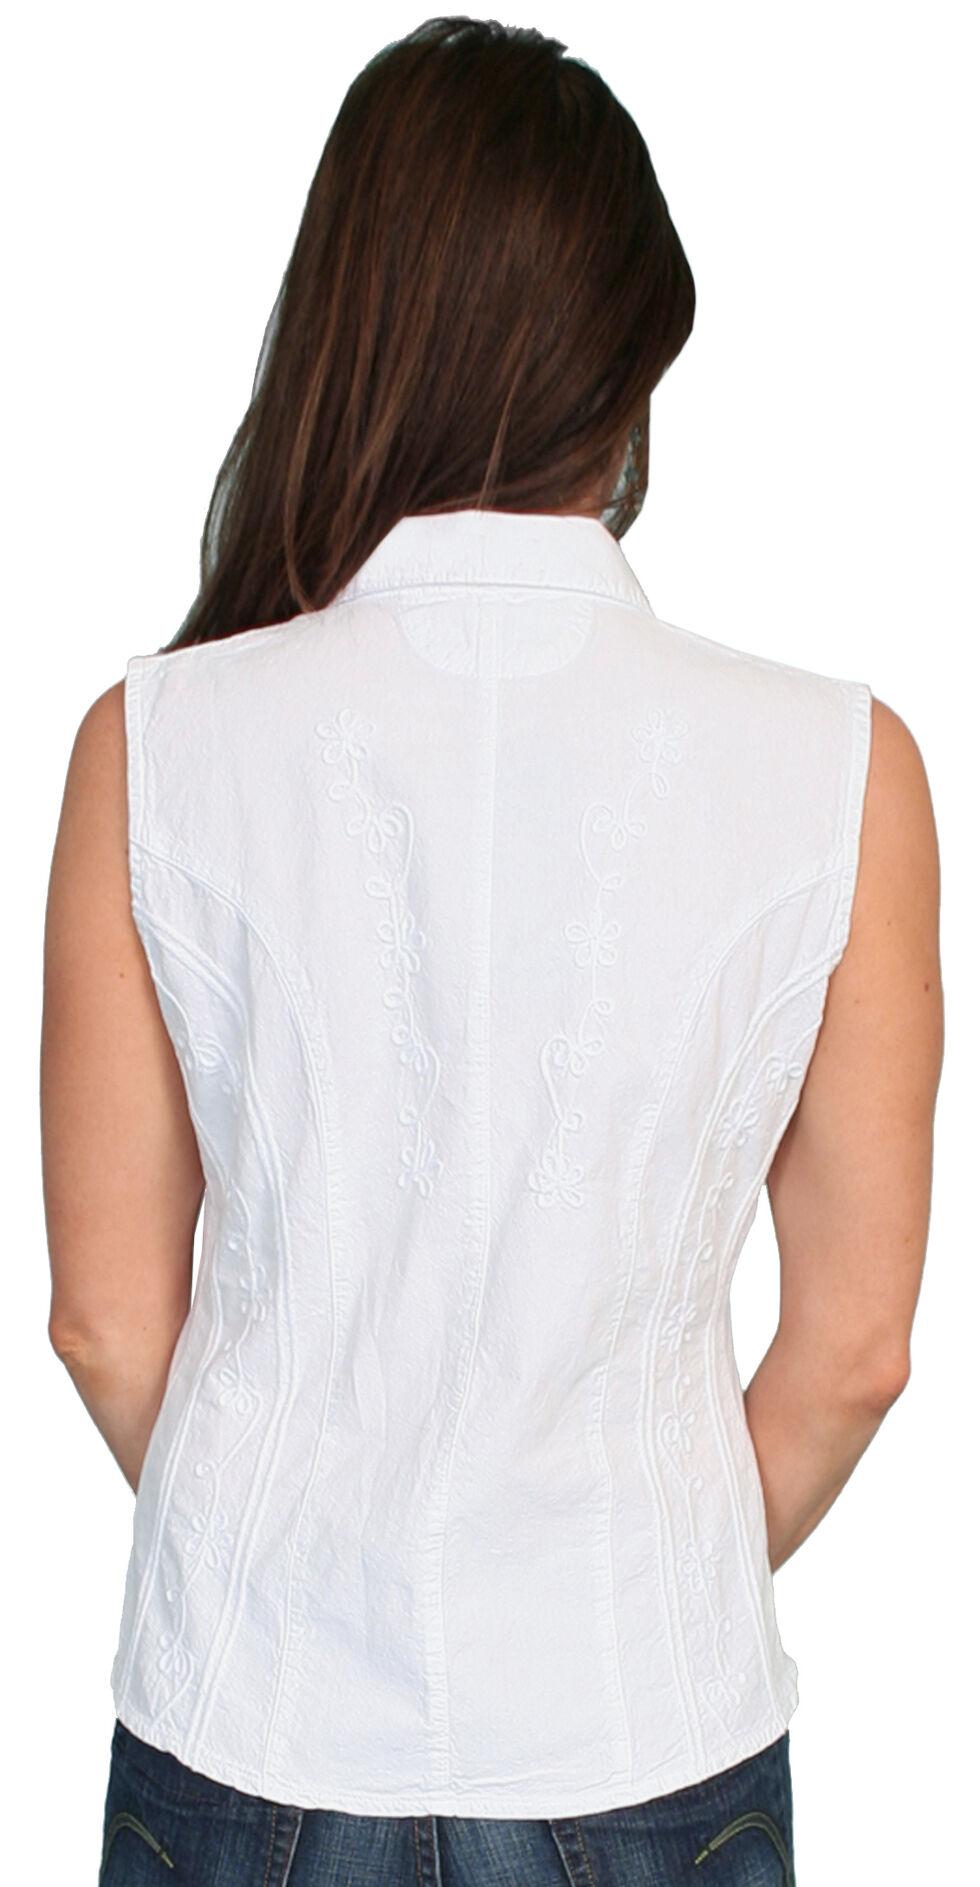 Scully Peruvian Cotton Sleeveless Top, White, hi-res